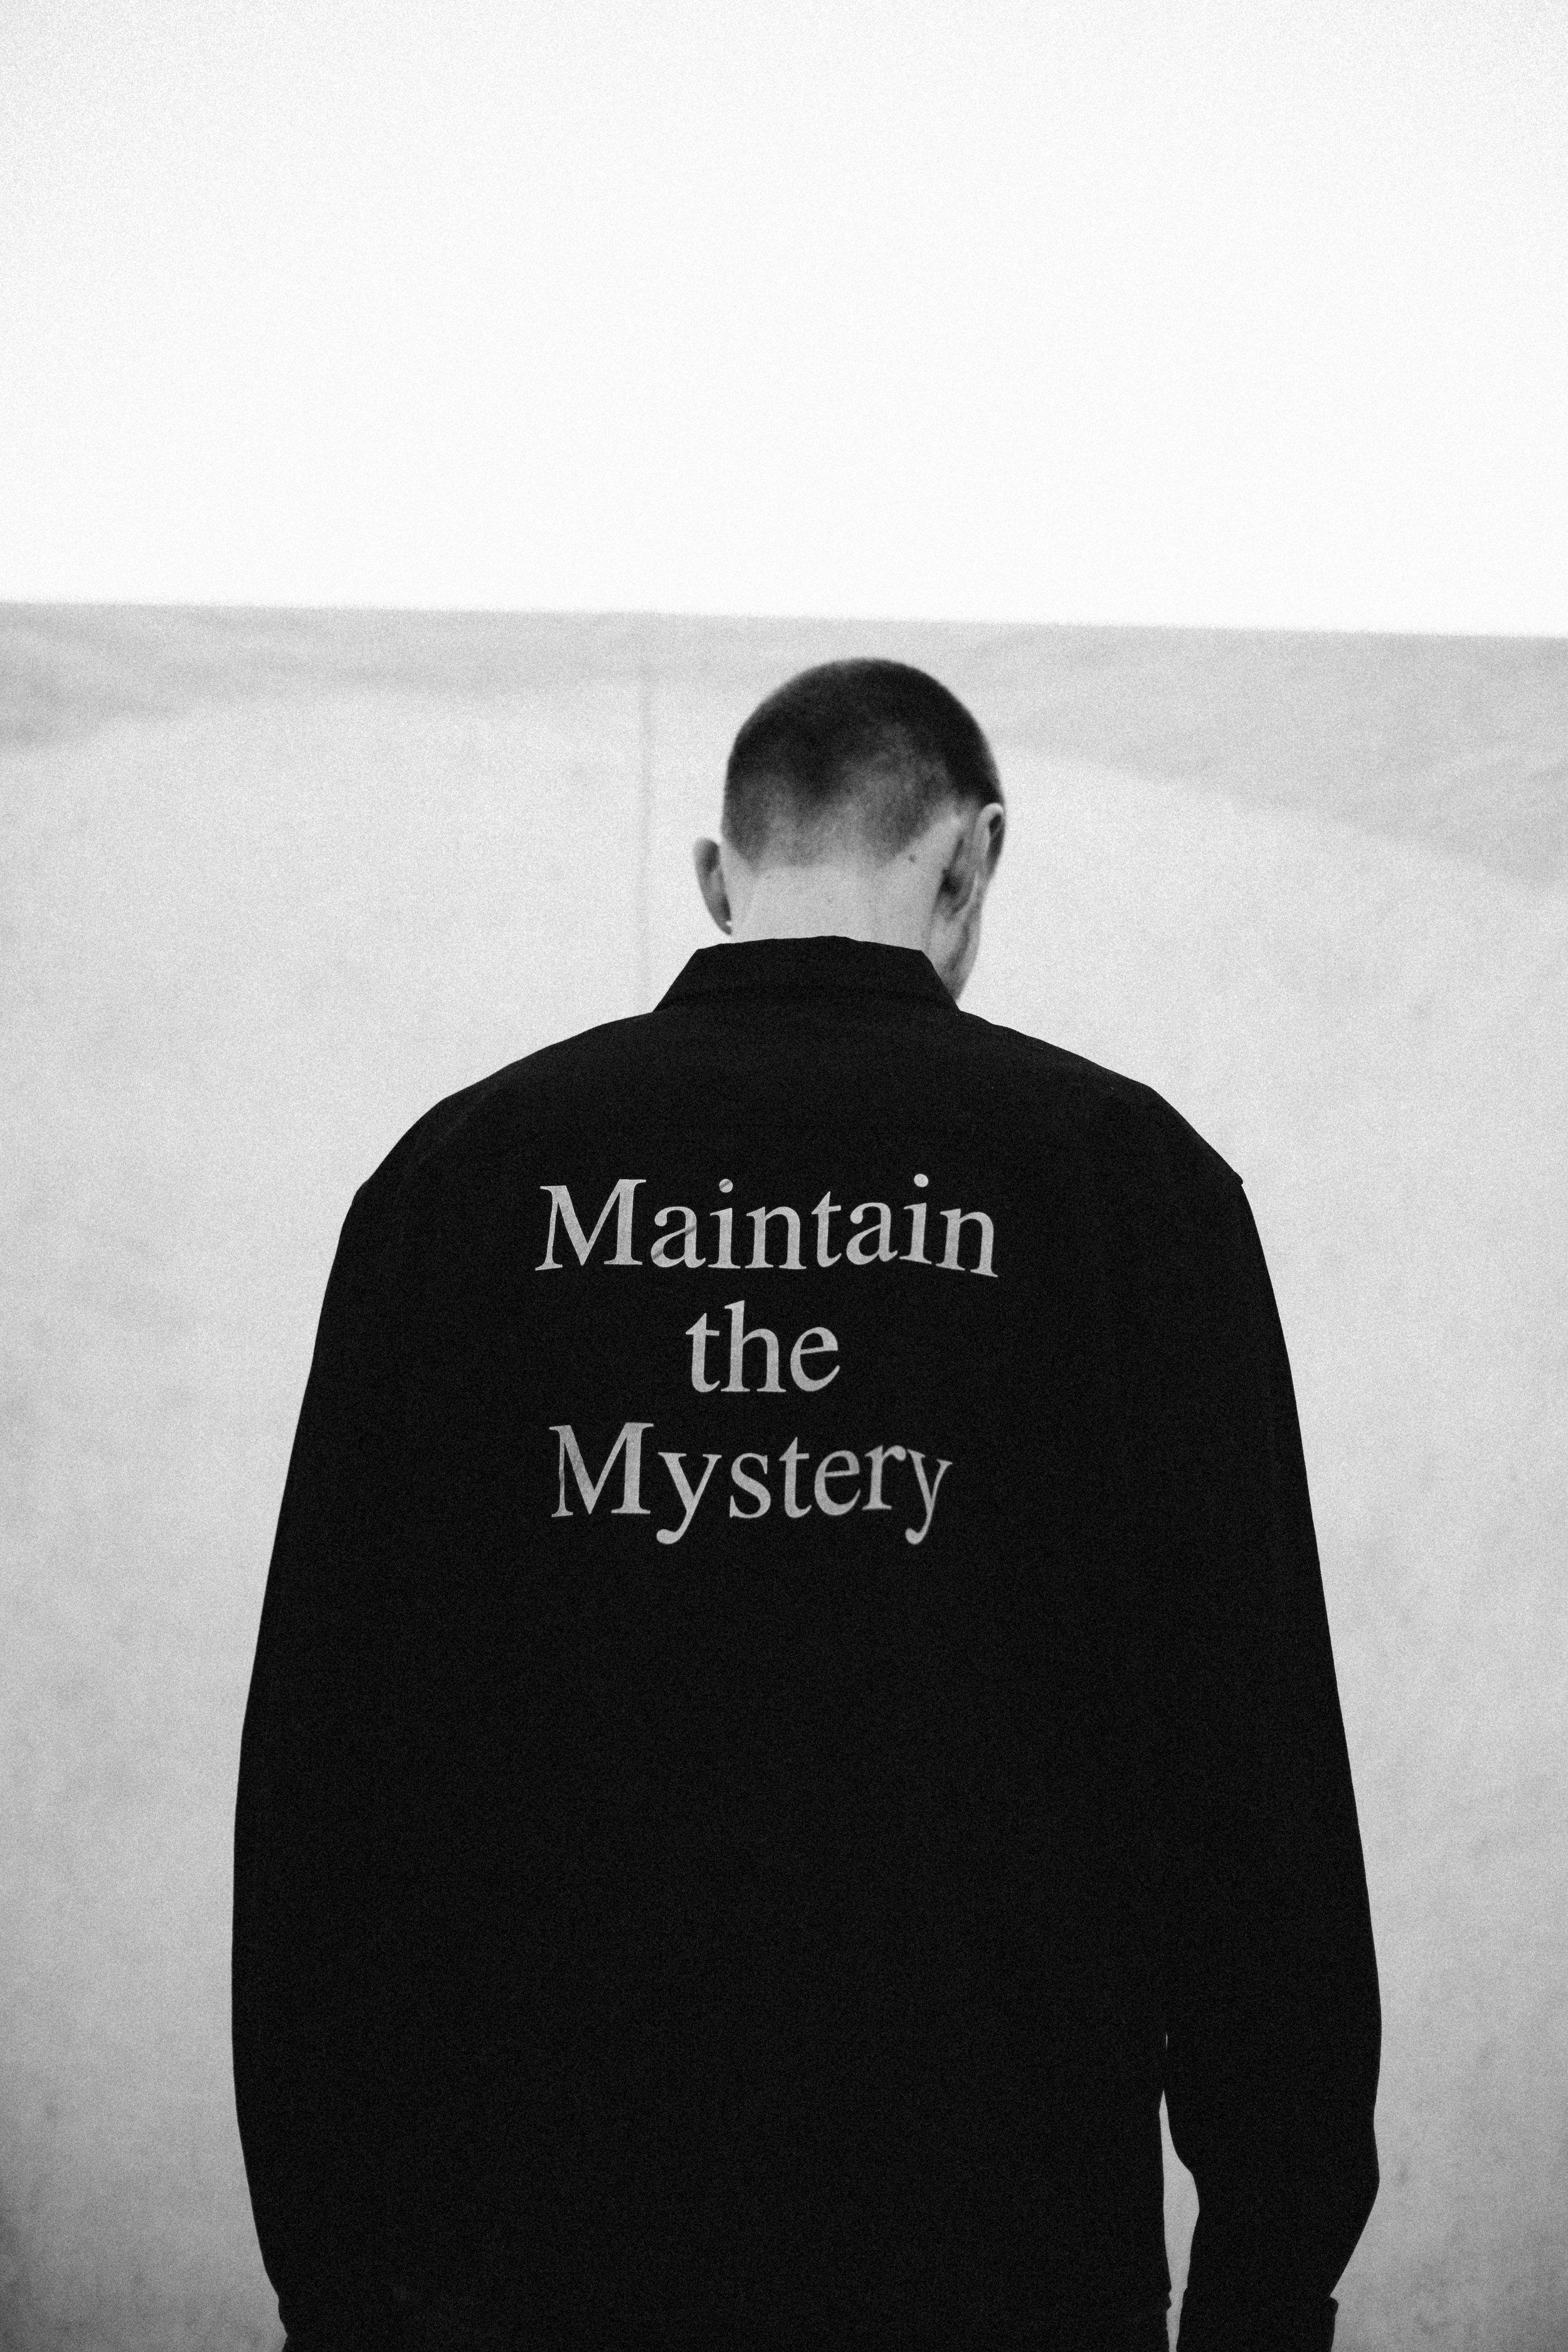 Maintain The Mystery (1 of 2).jpg